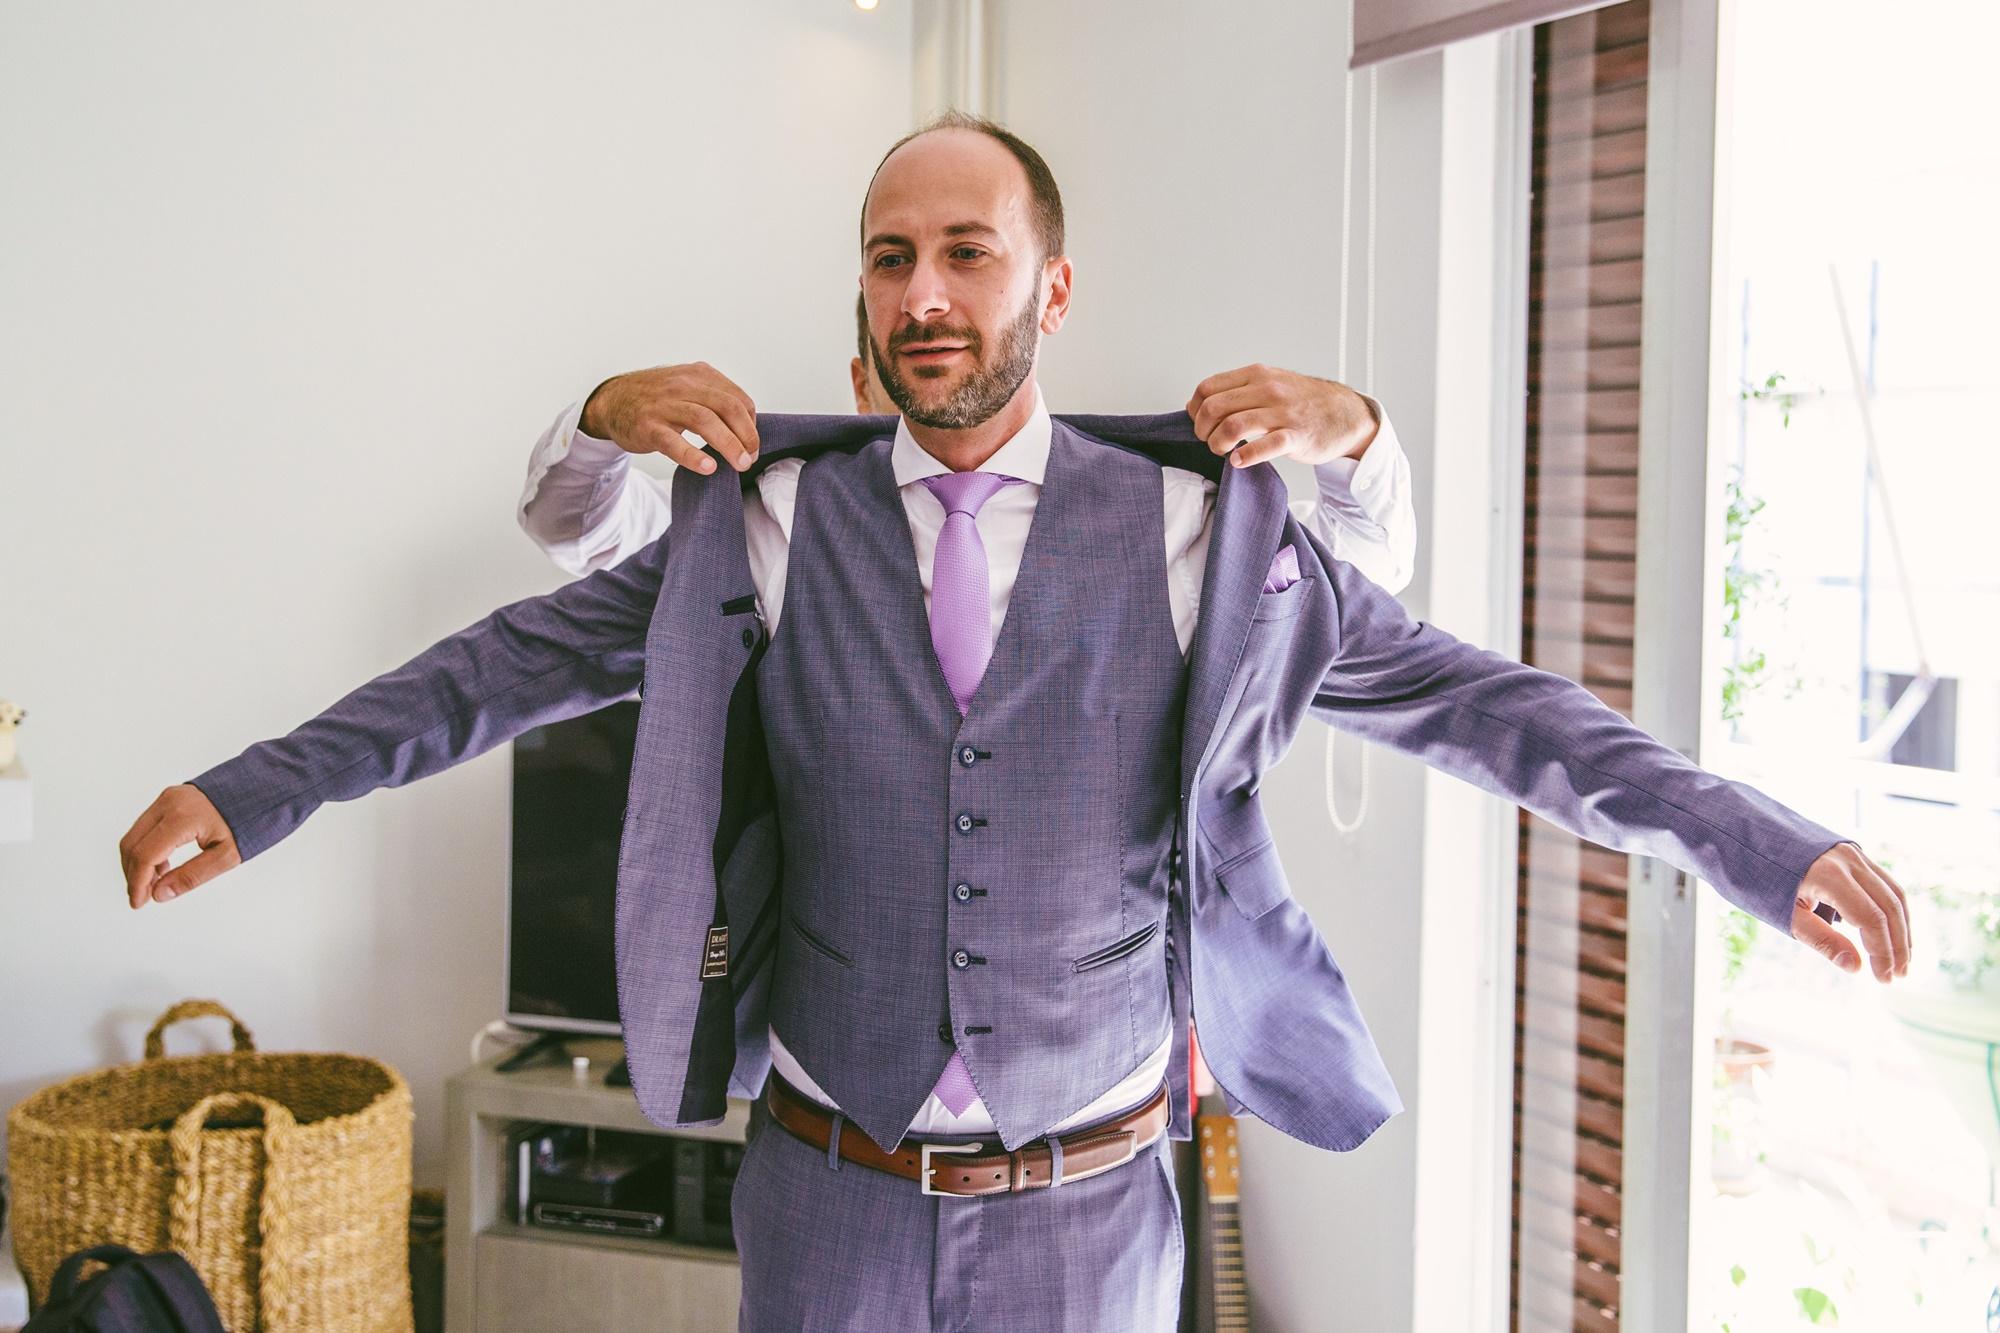 8318b95f573c 5+1 Υπέροχες εναλλακτικές λύσεις για το κοστούμι του γαμπρού ...